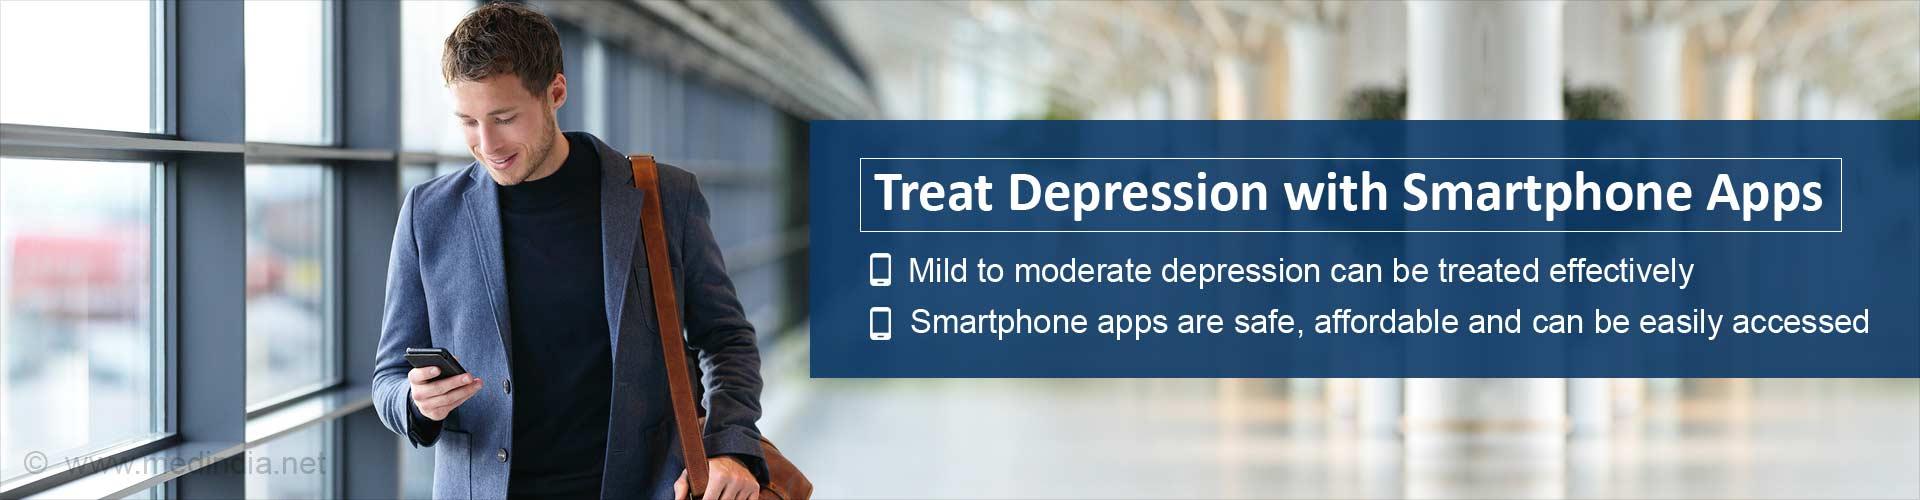 Smartphone Apps Help Treat Depression